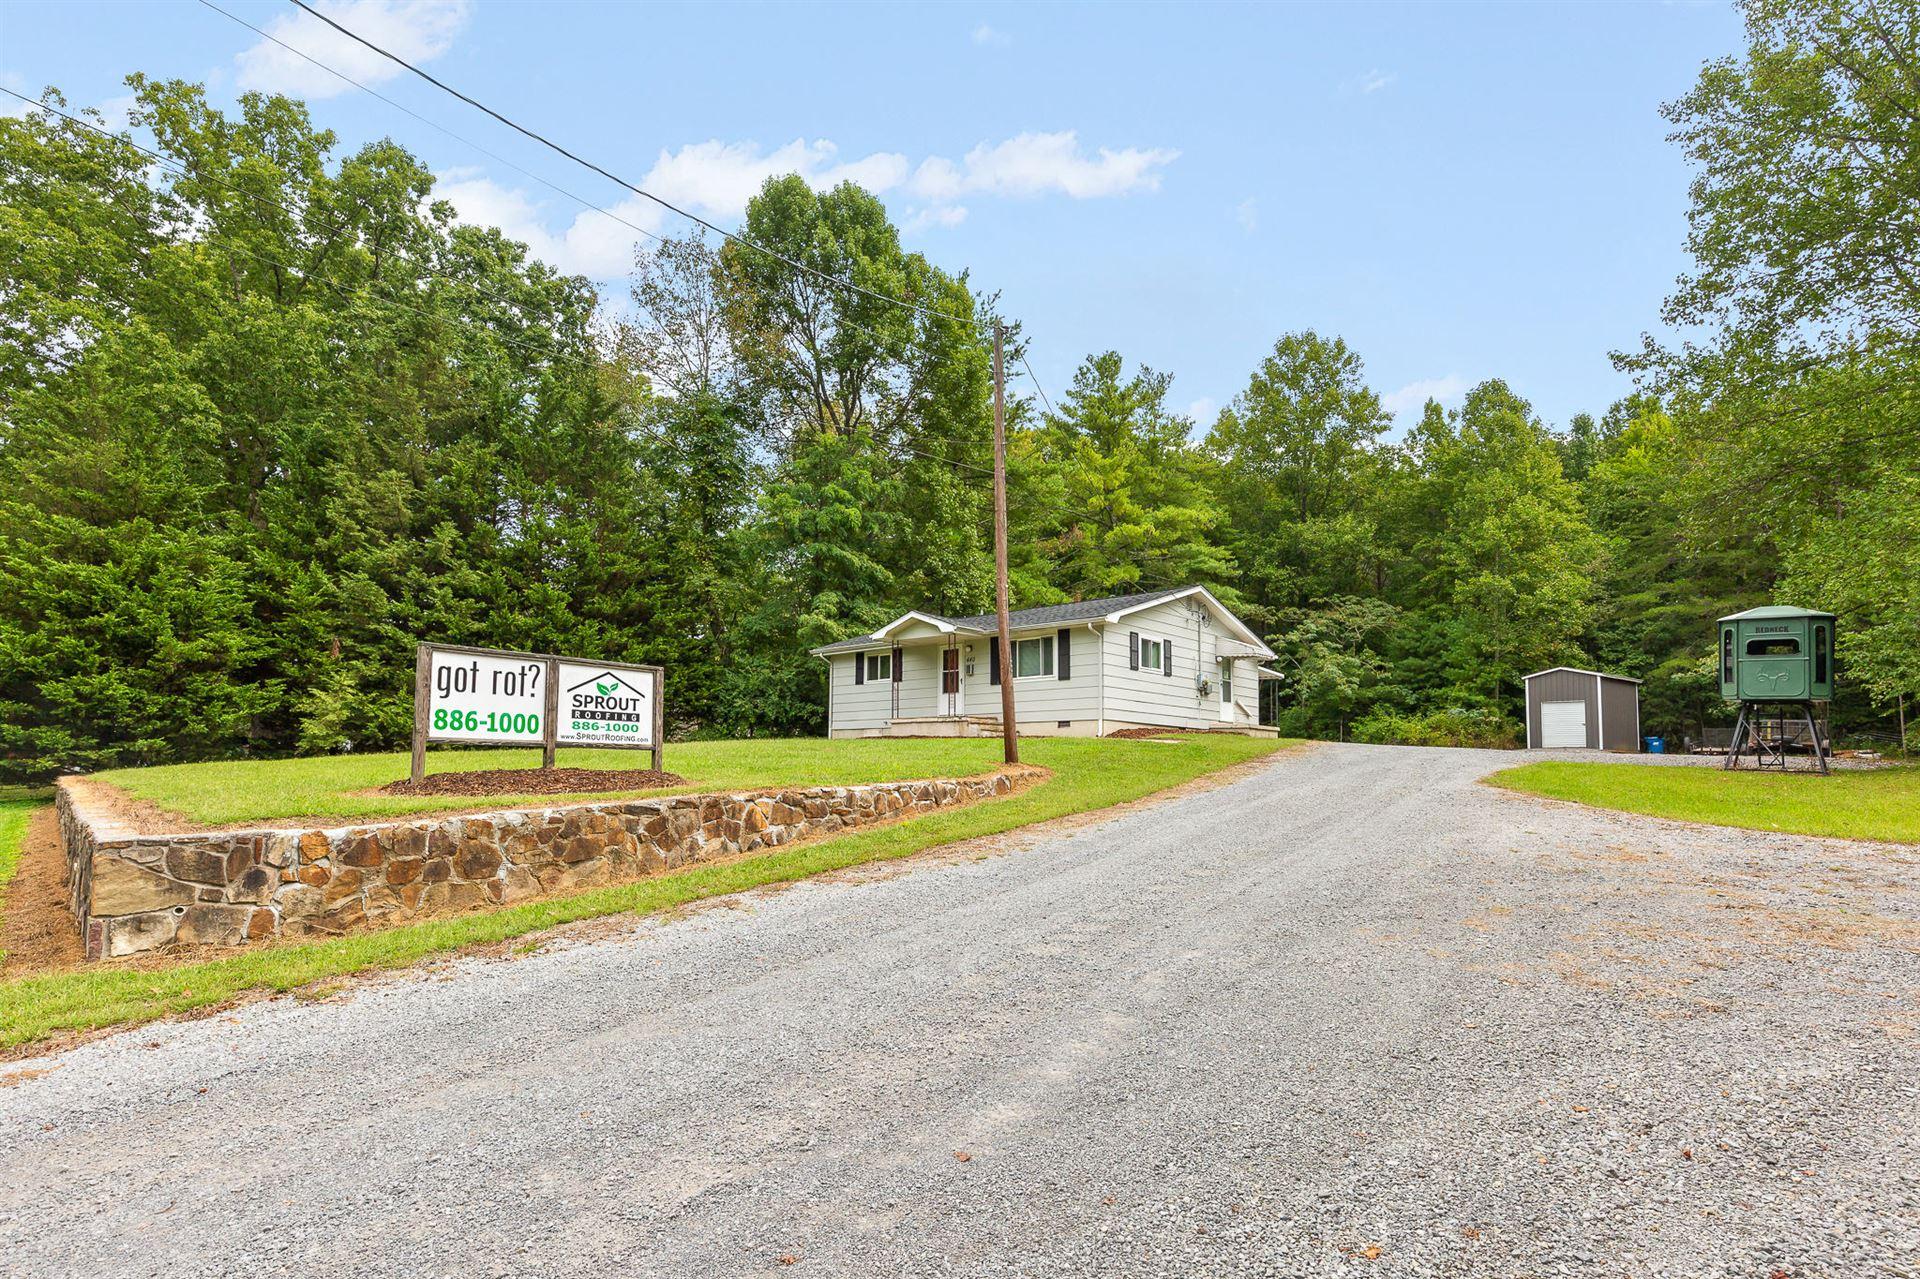 440 Timberlinks Dr, Signal Mountain, TN 37377 - MLS#: 1324507